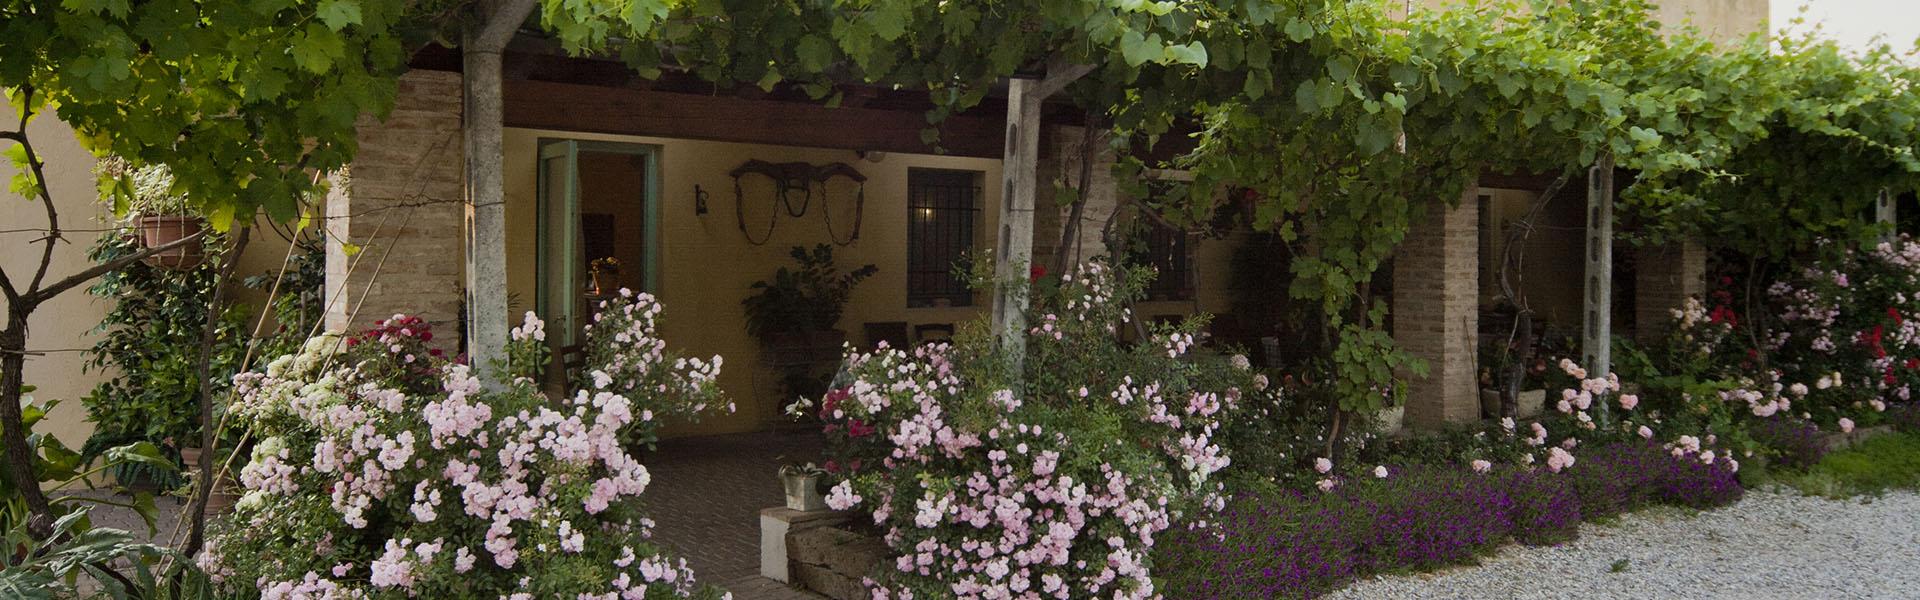 Agriturismo Corte Gaia Alloggio e Cucina tipica